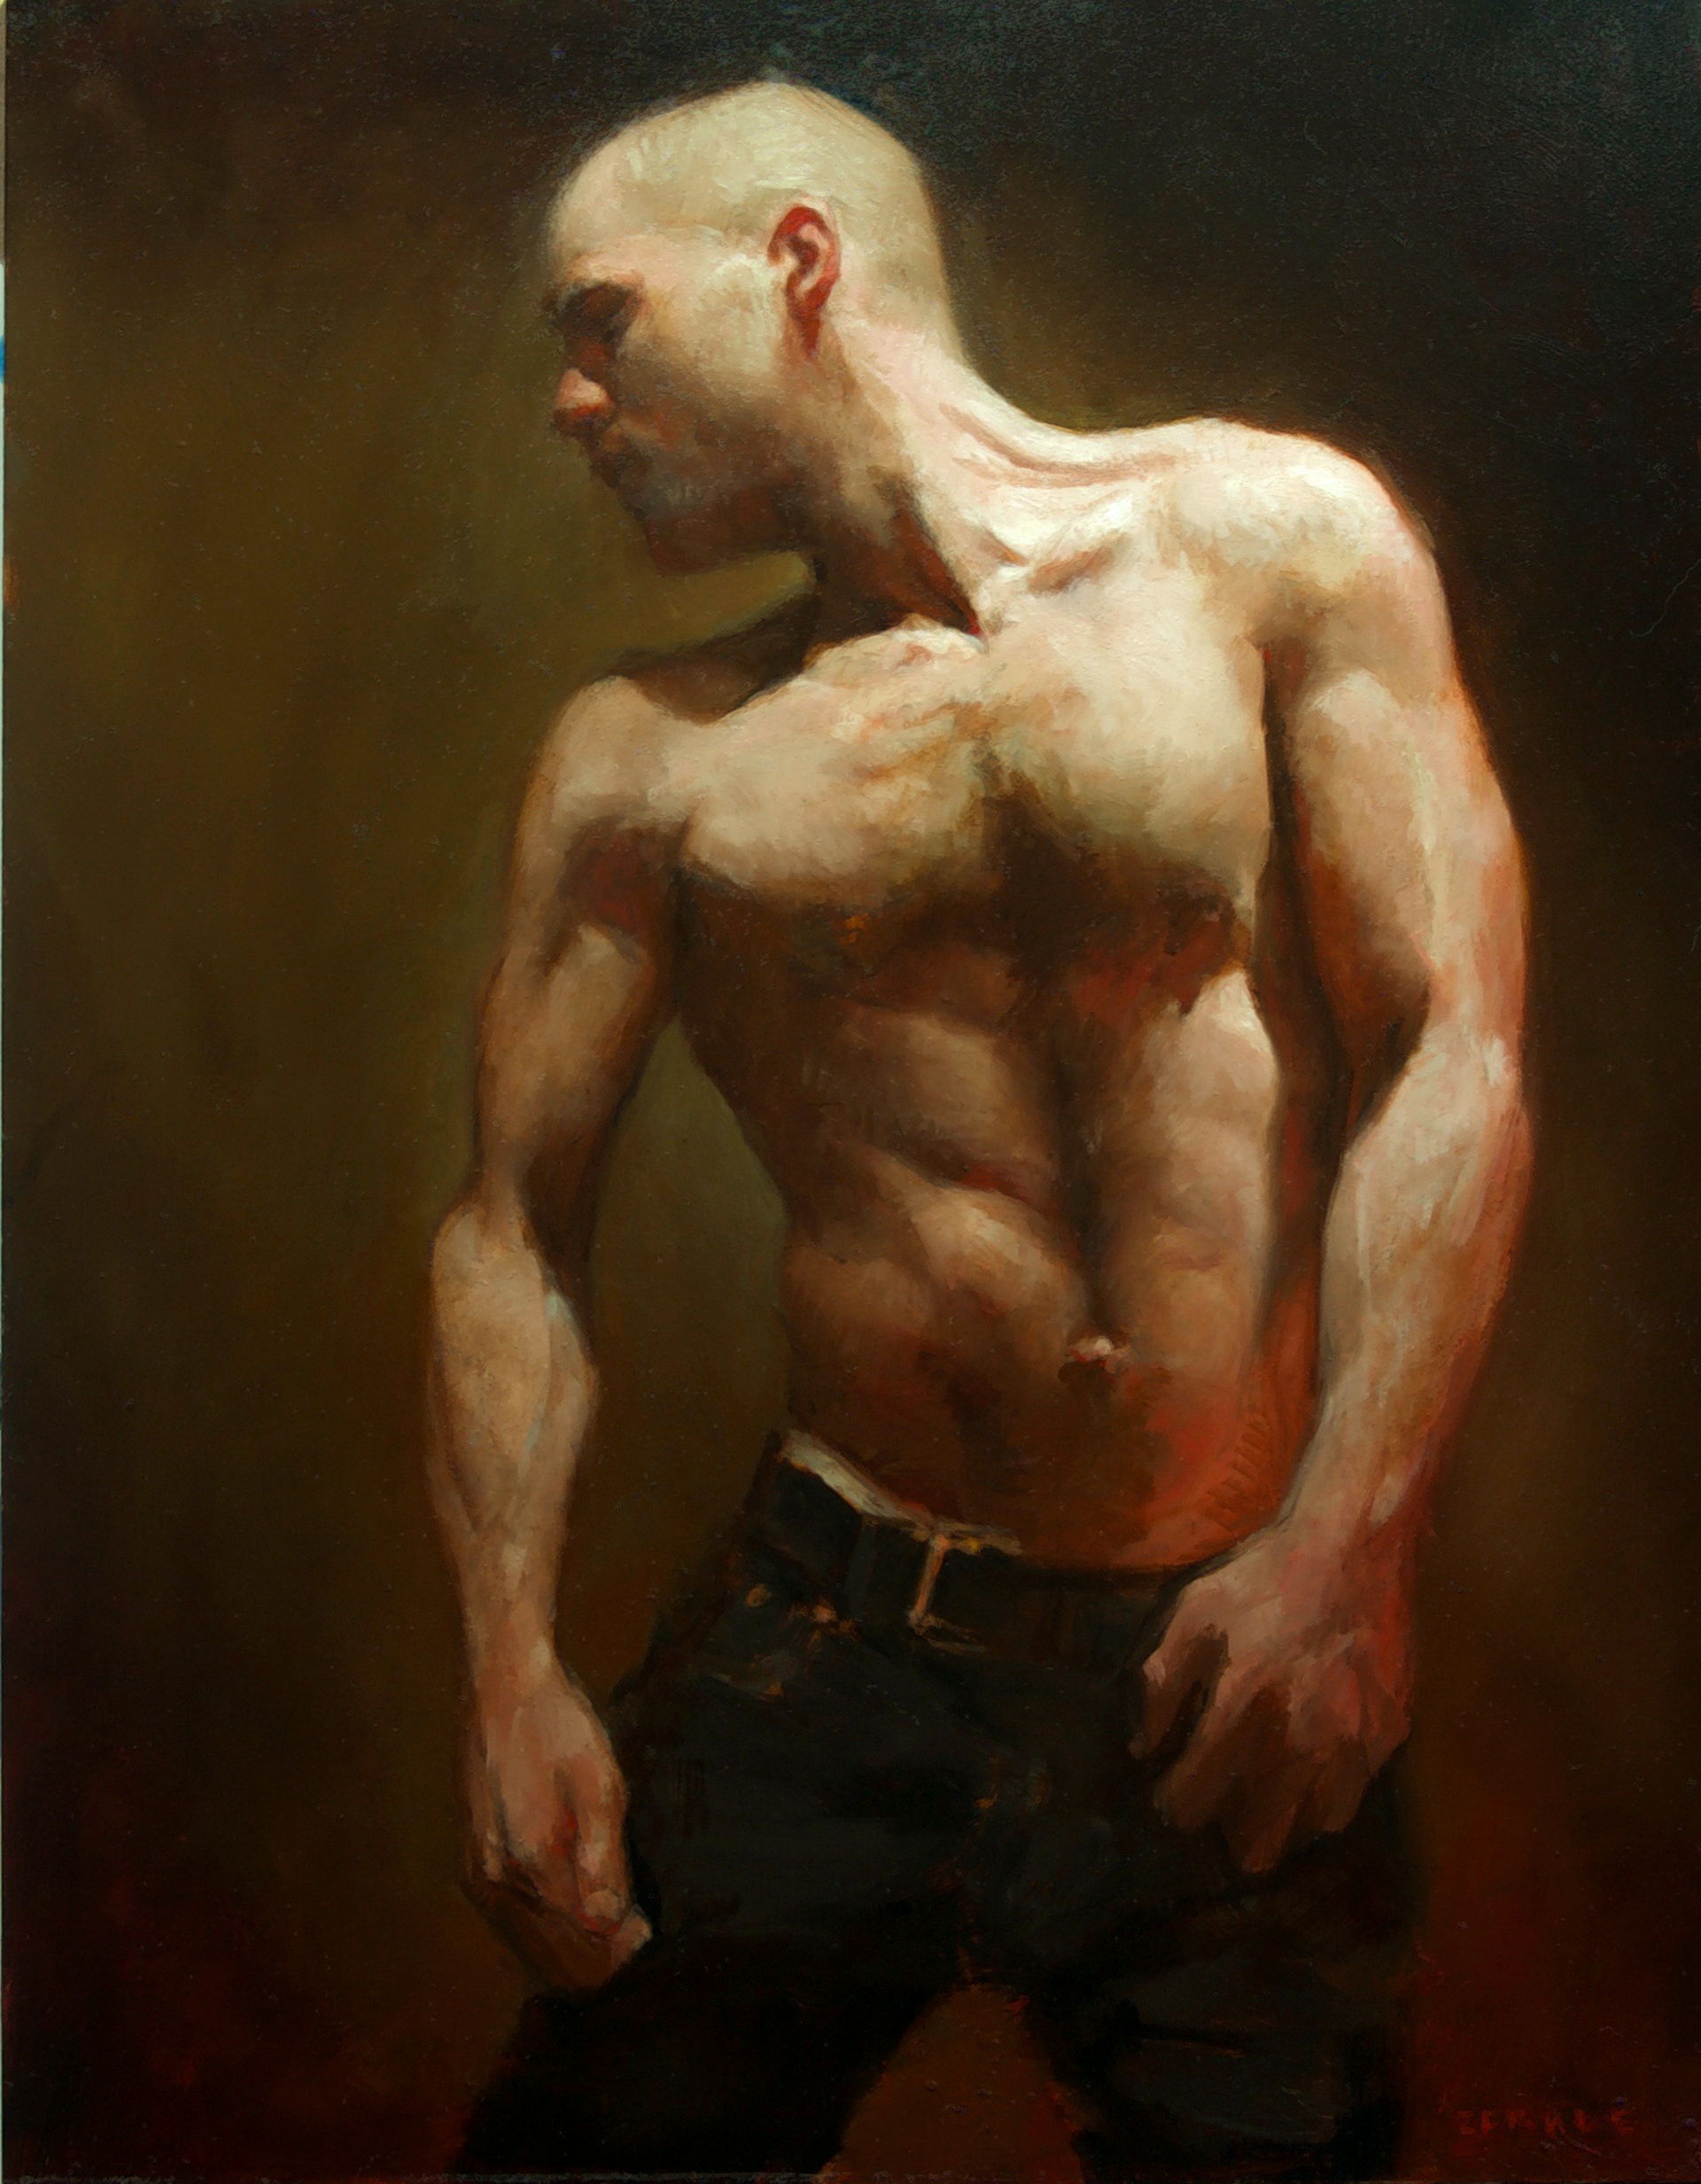 Warm Man by Zack Zdrale